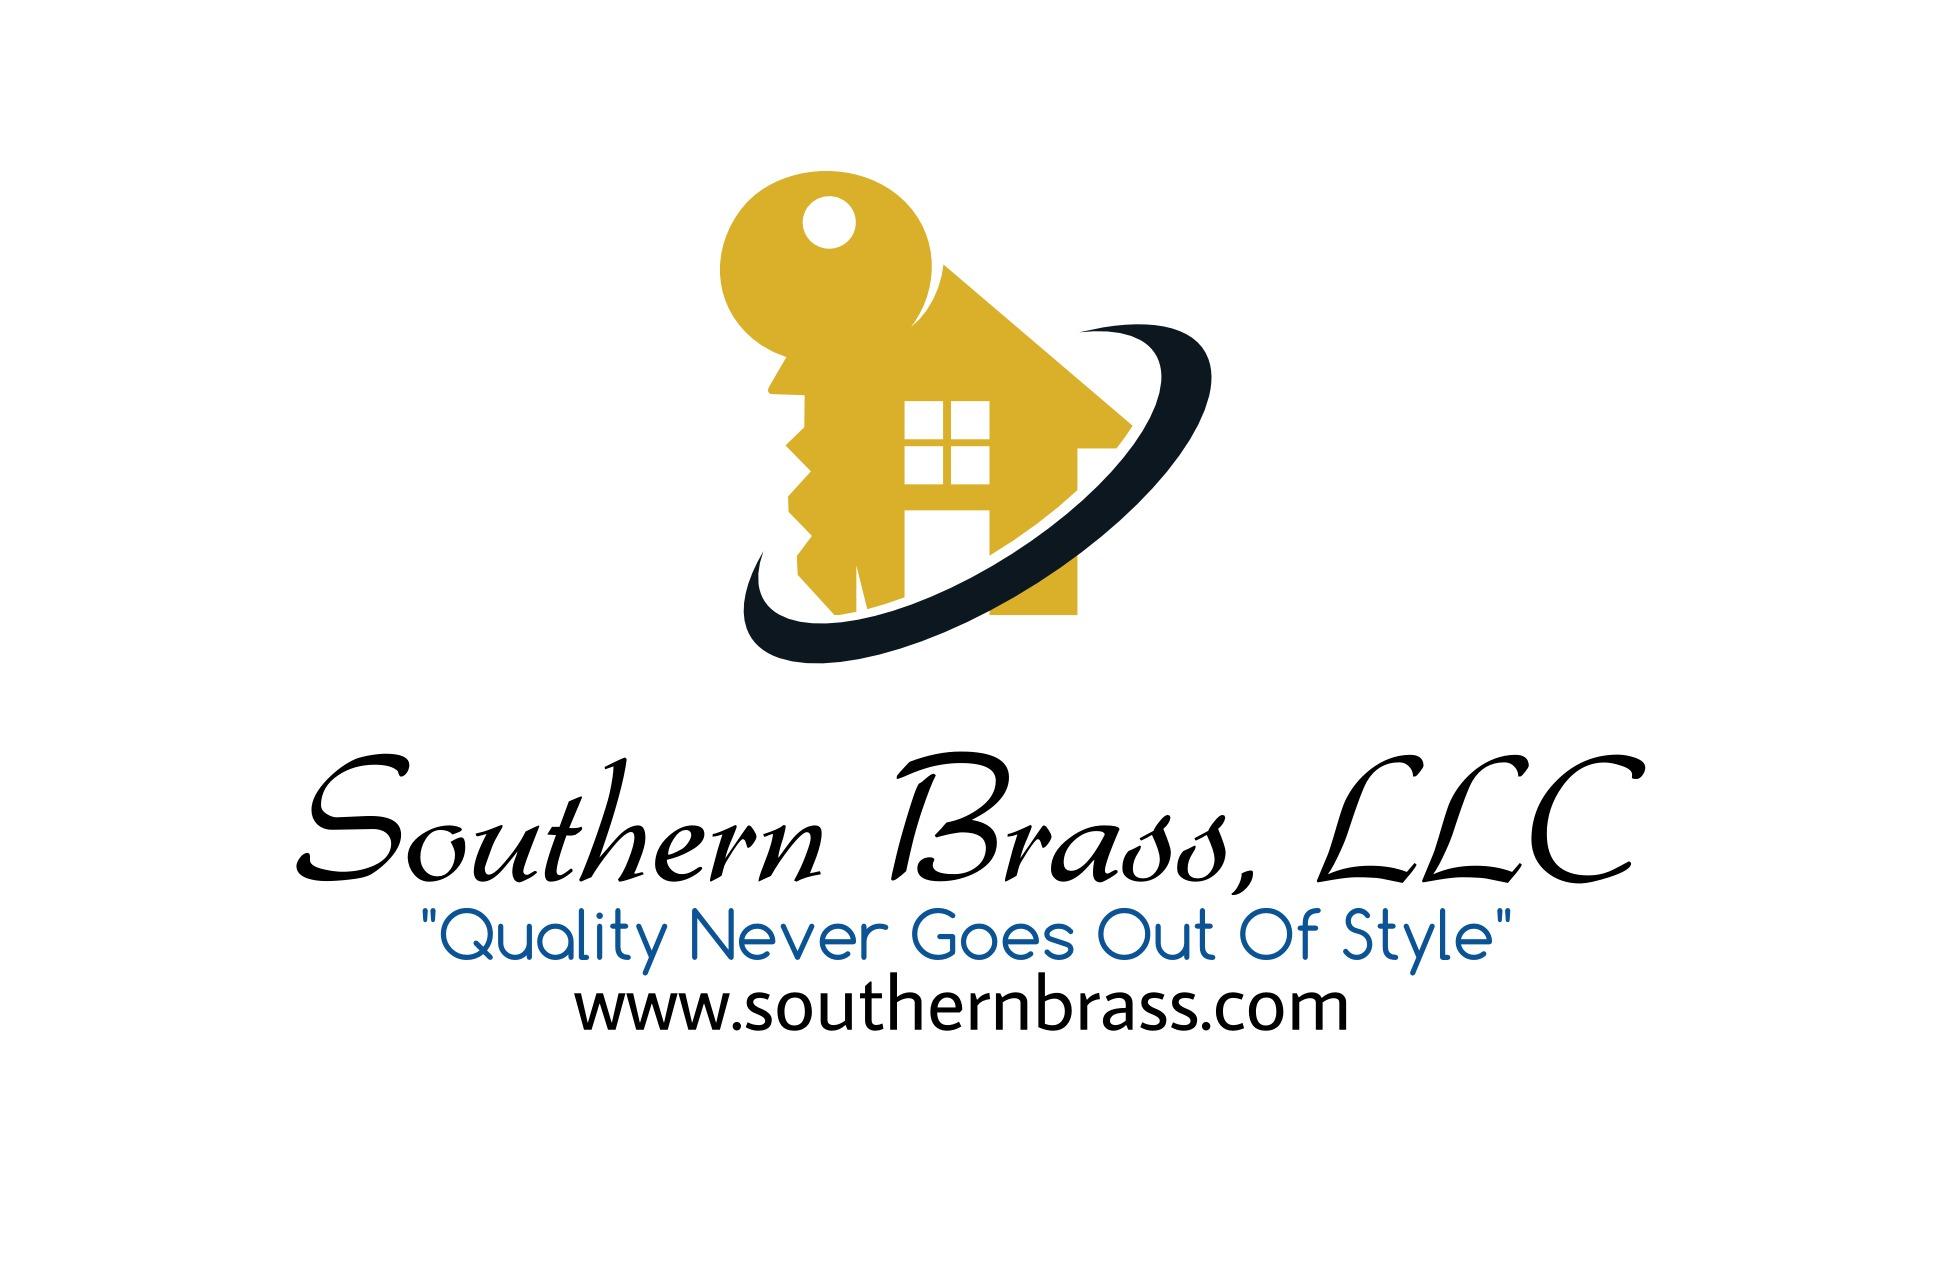 Southern Brass LLC Business Logo